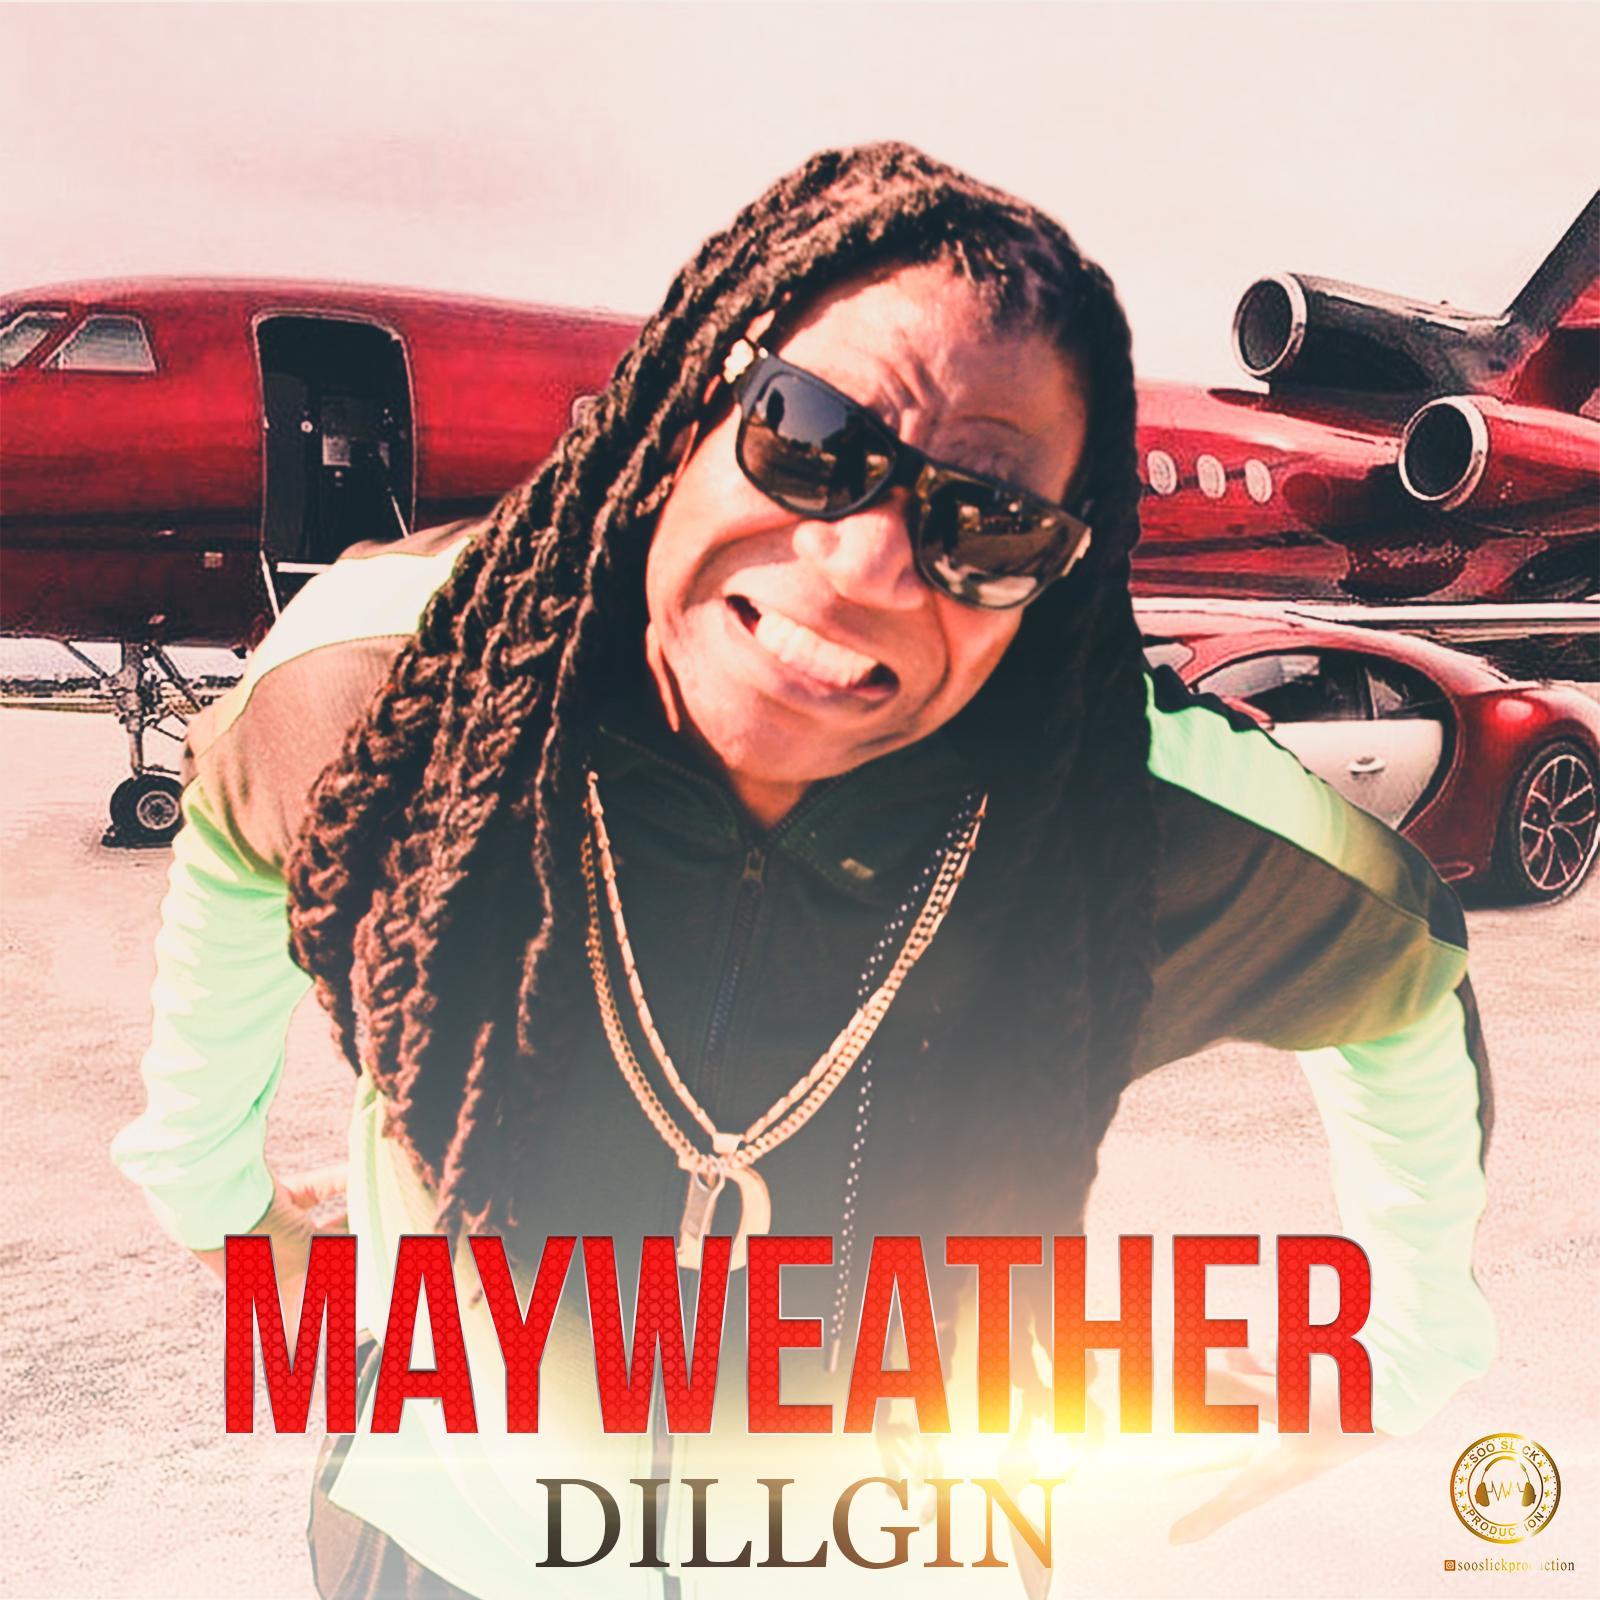 Dillgin New Dancehall 2021 Release Mayweather